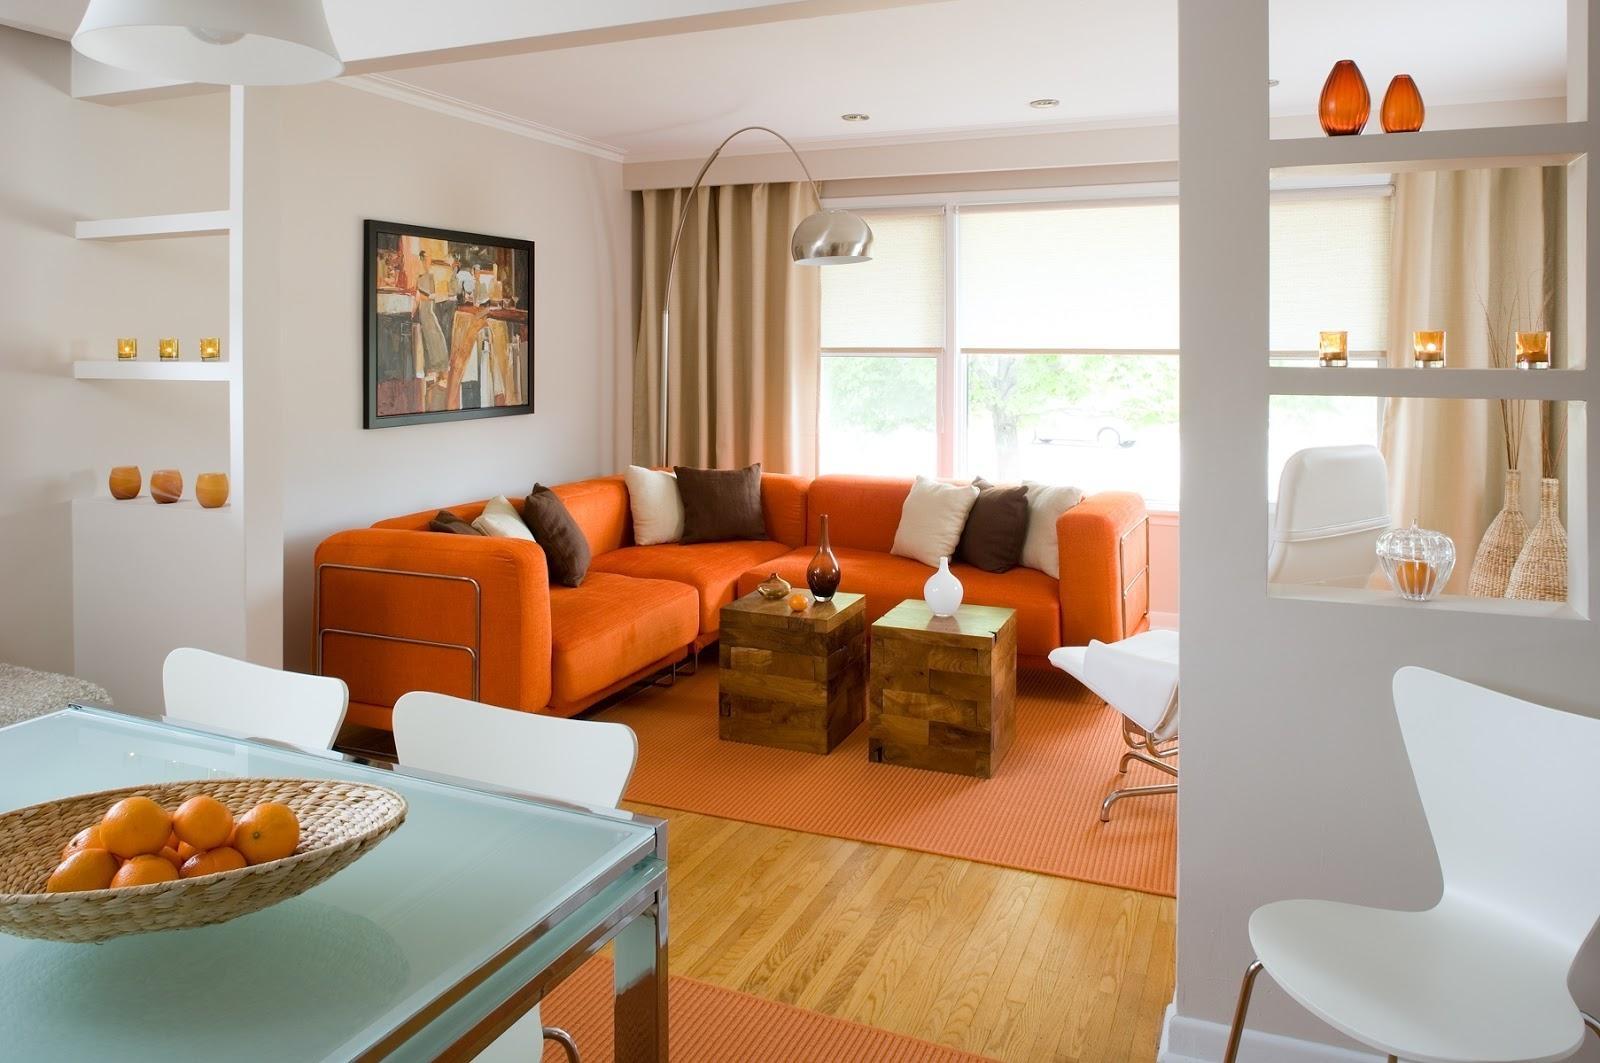 Marvellous Orange Living Room Furniture Design – Orange Accent Throughout Orange Sofa Chairs (View 18 of 20)